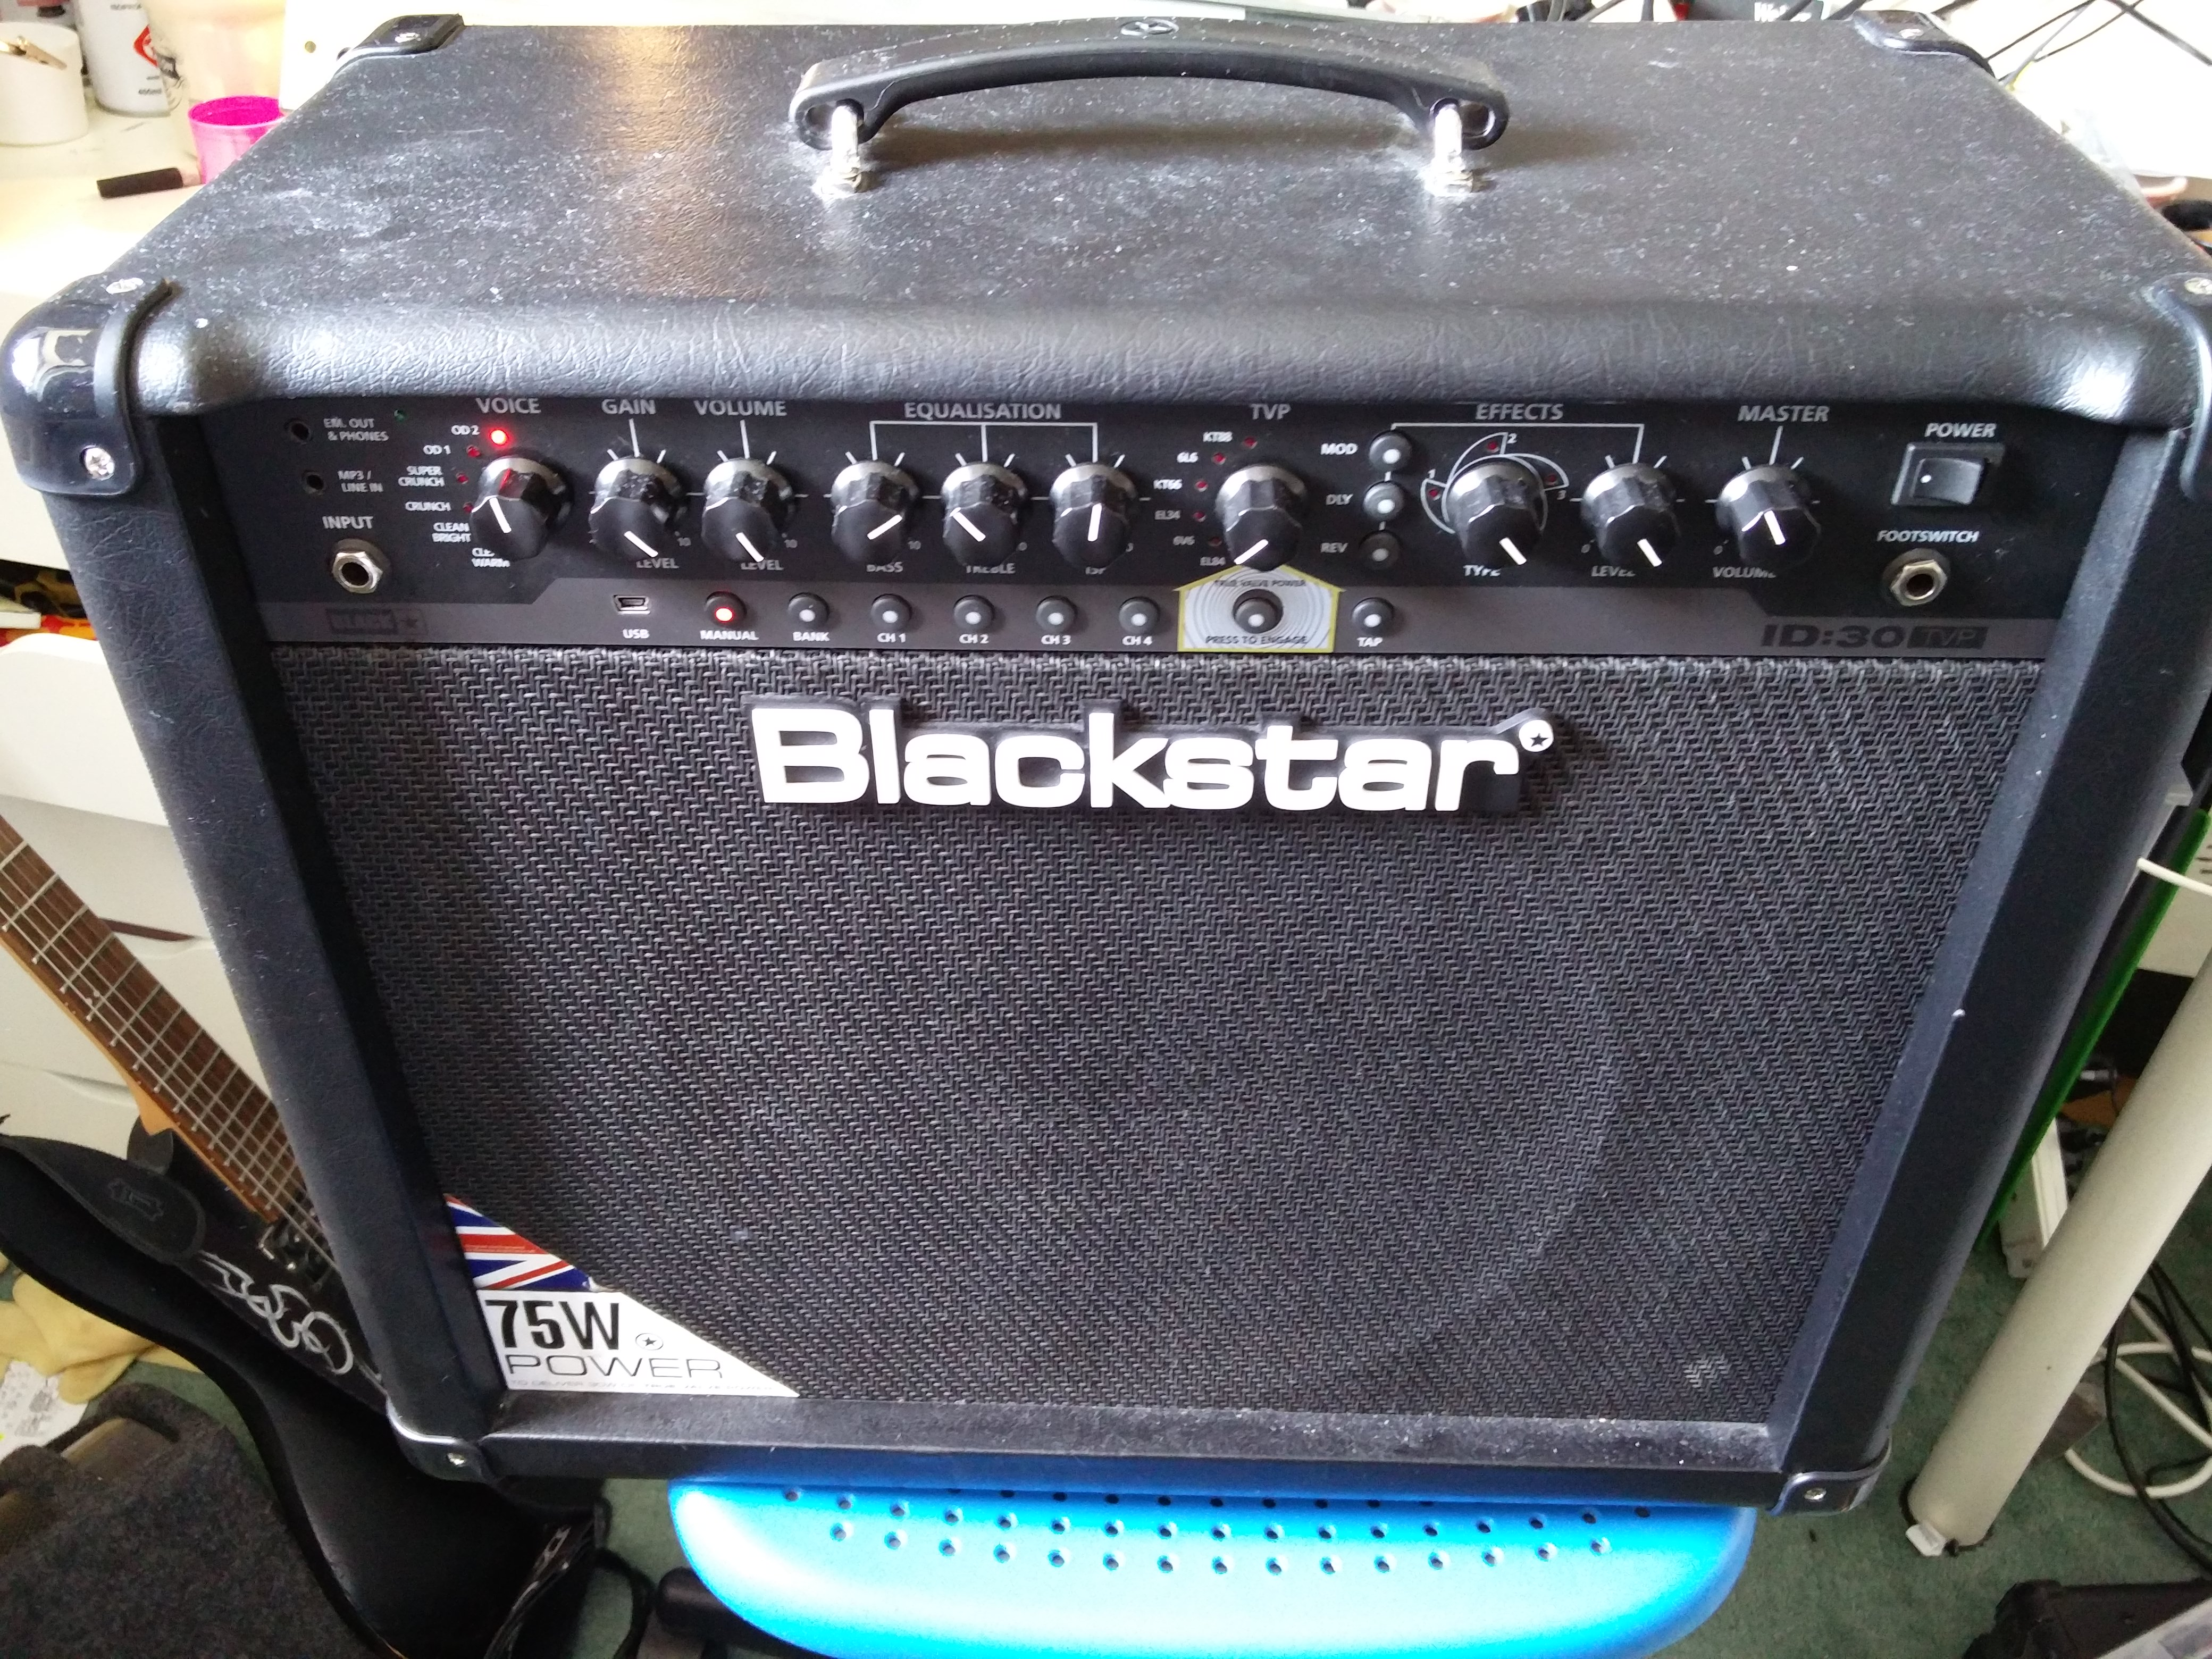 Blackstar ID-30 TVP repair